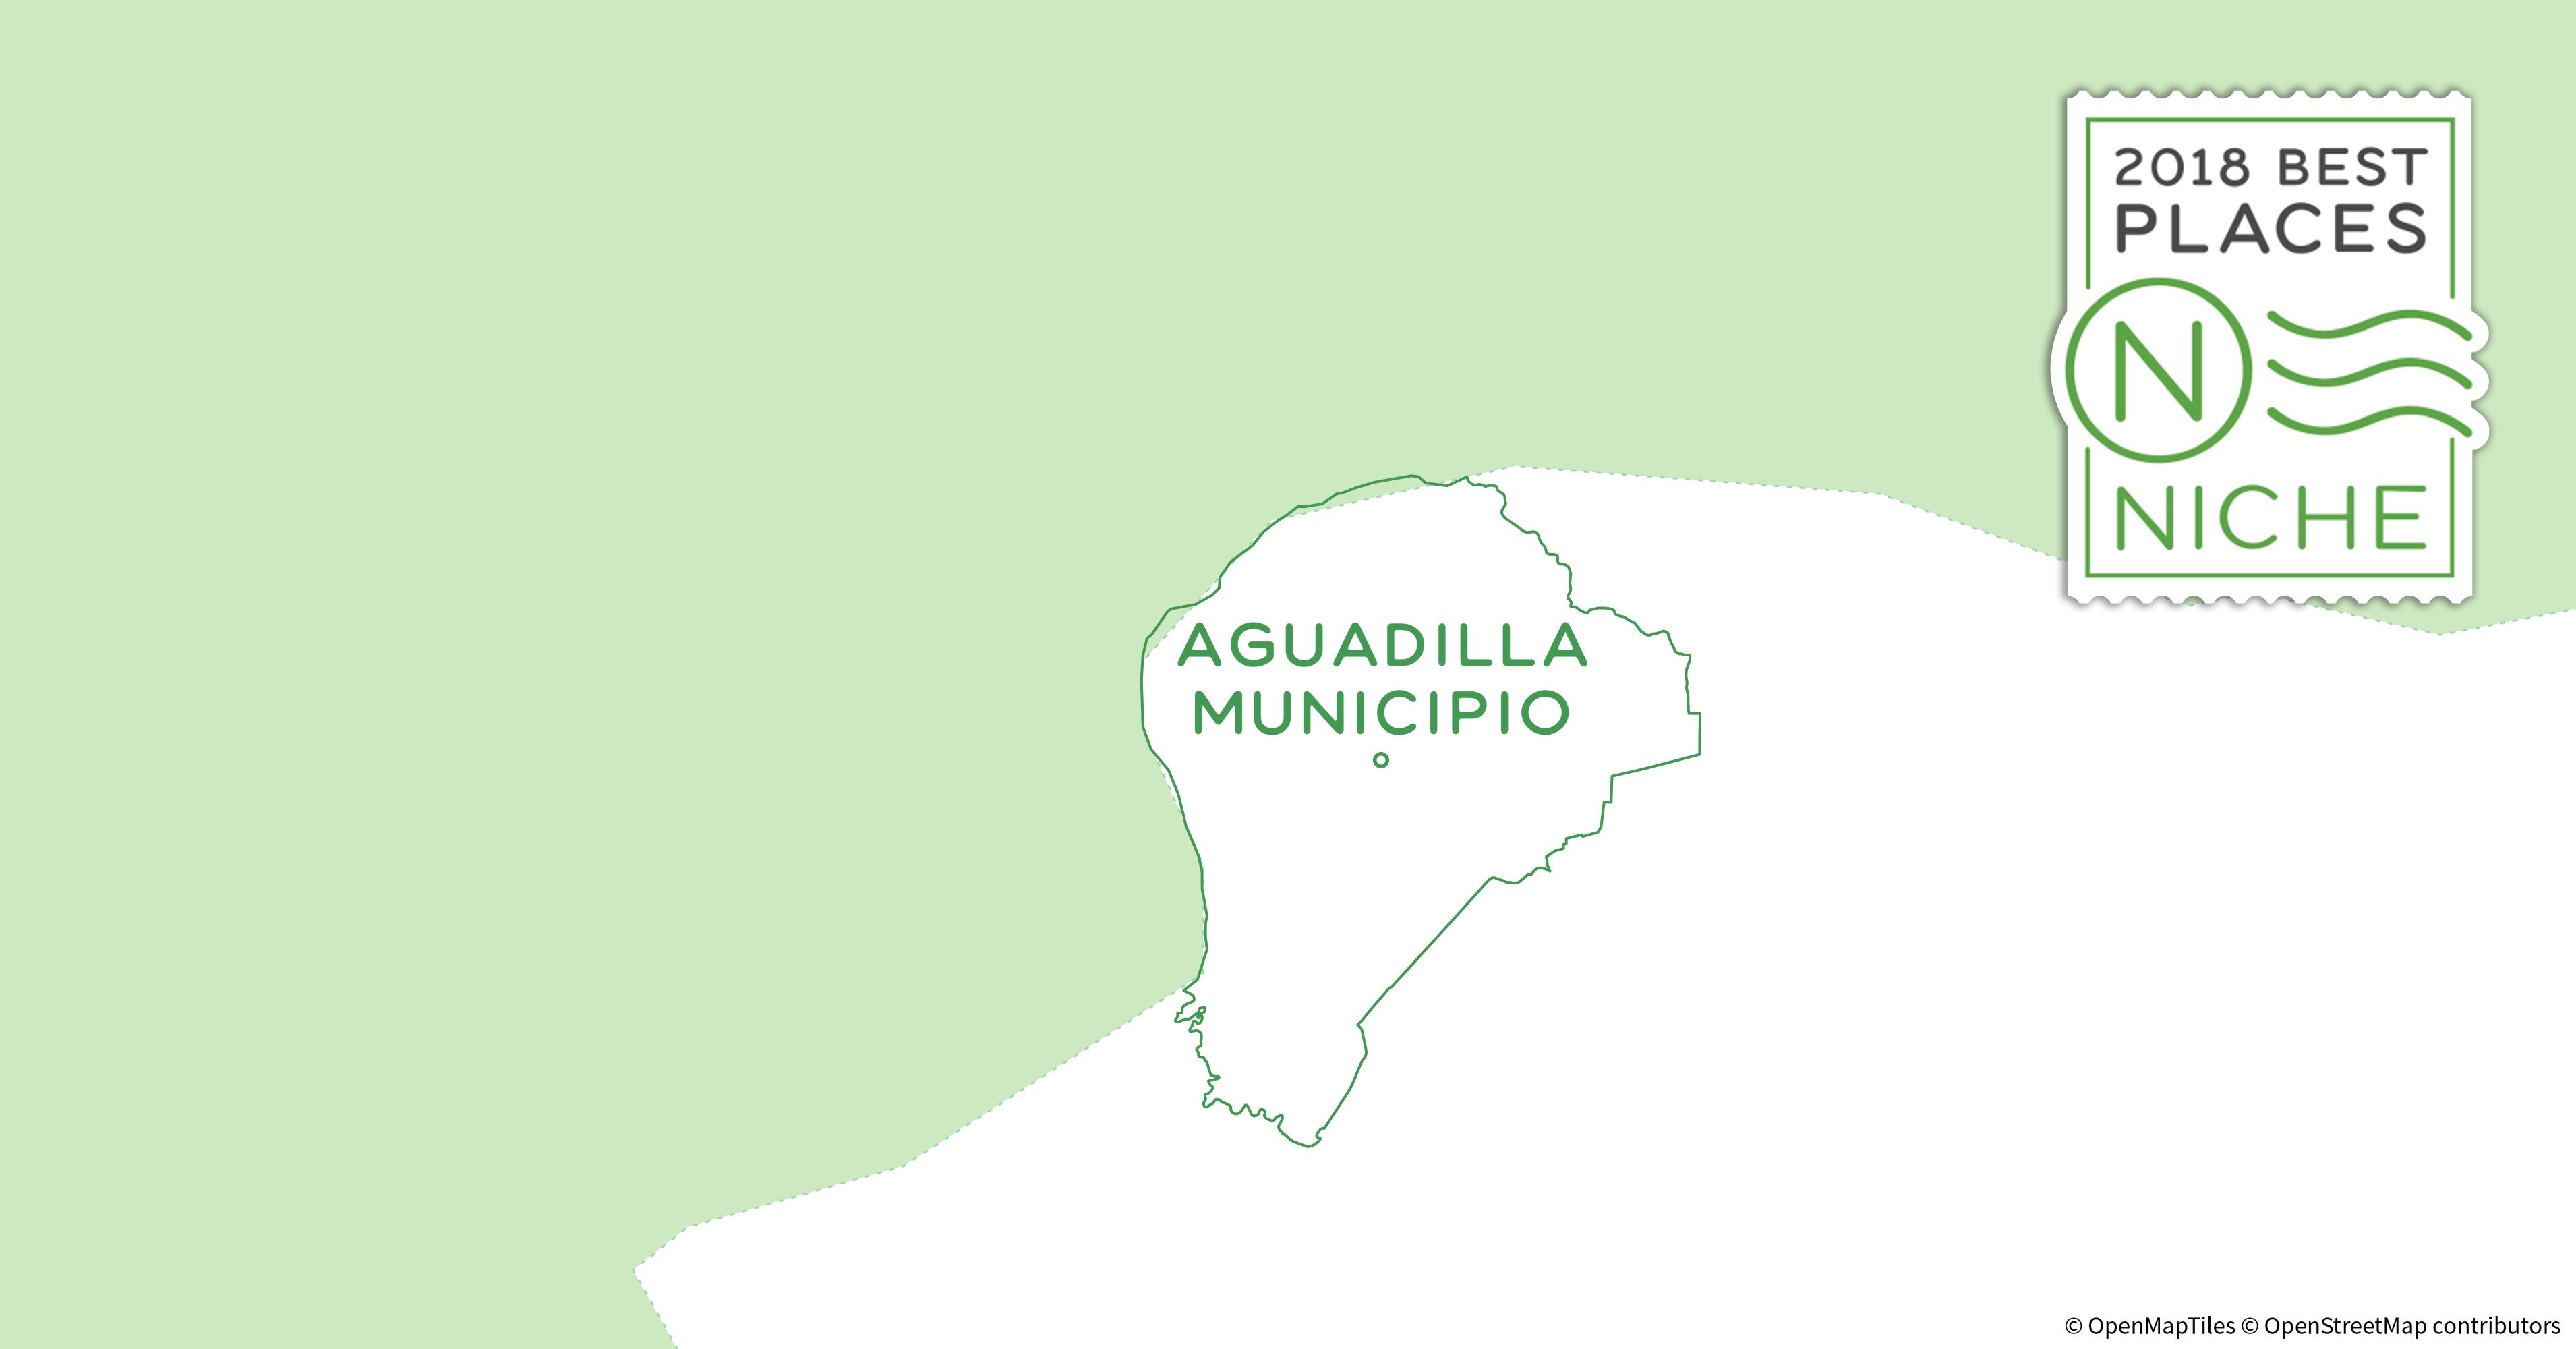 2018 Best Zip Codes To Buy A House In Aguadilla Municipio Pr Niche